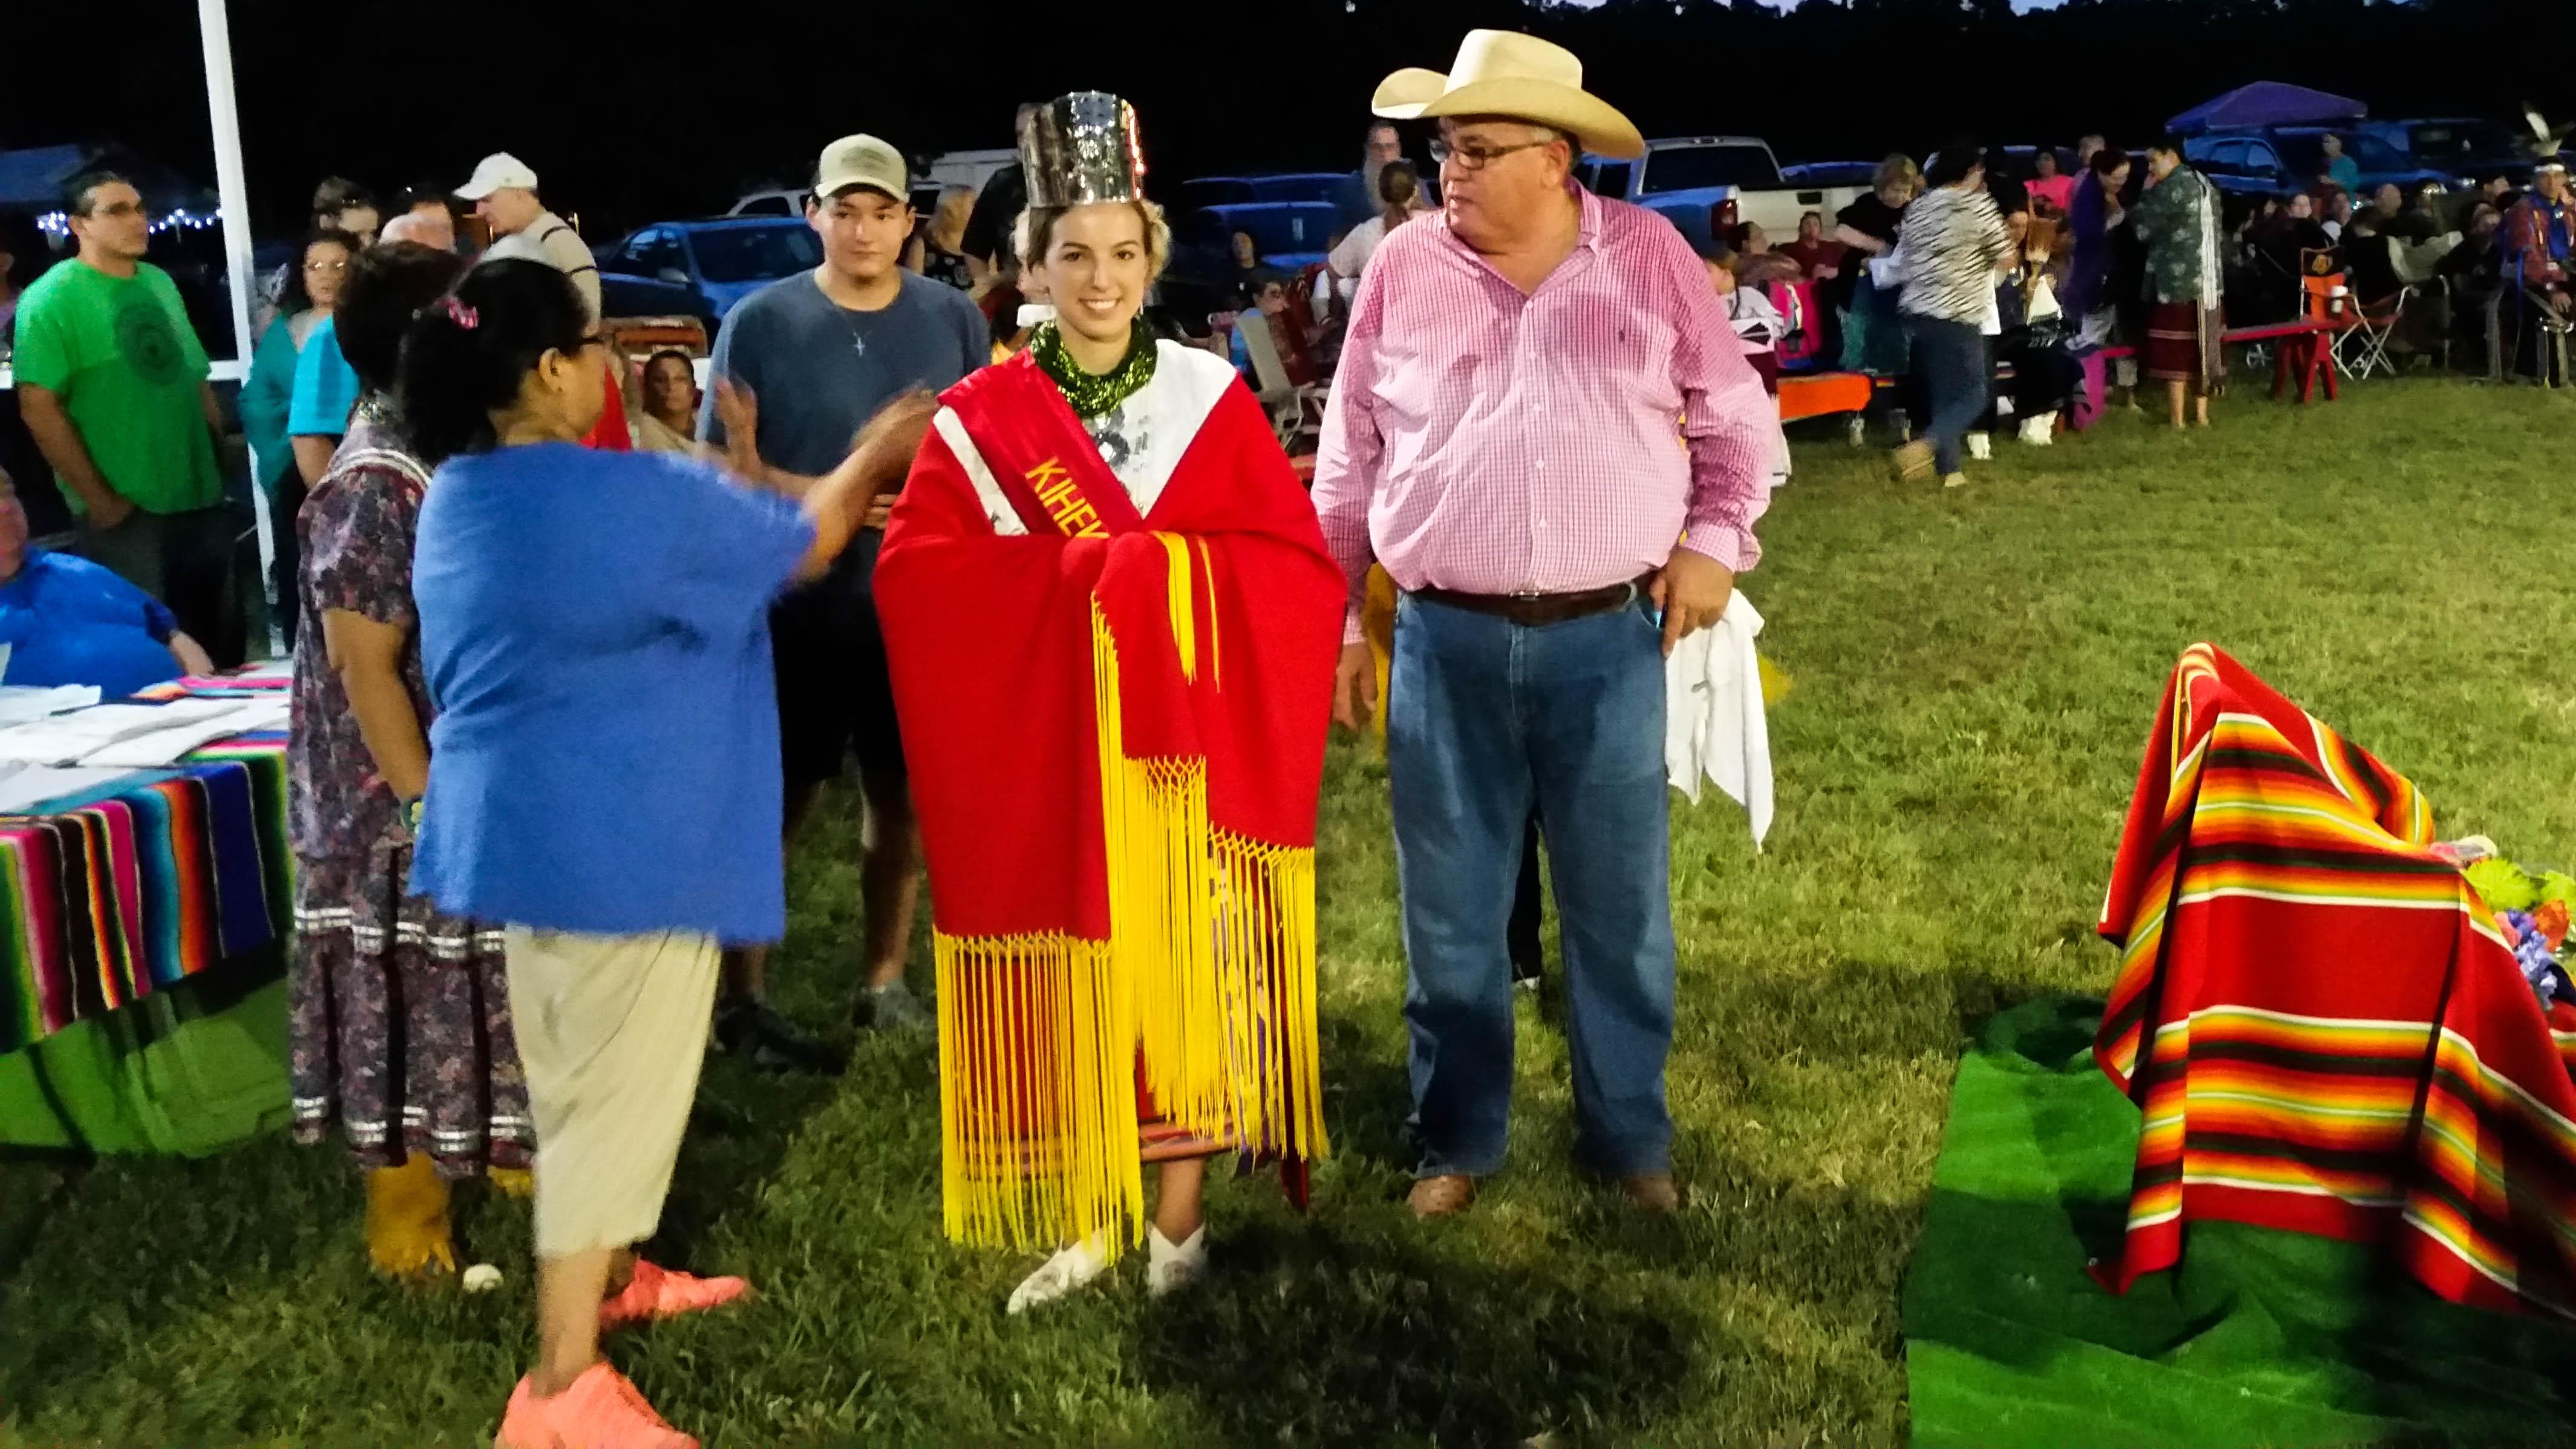 Berrey crowned 2016-2017 Kihekah-Steh Powwow Princess